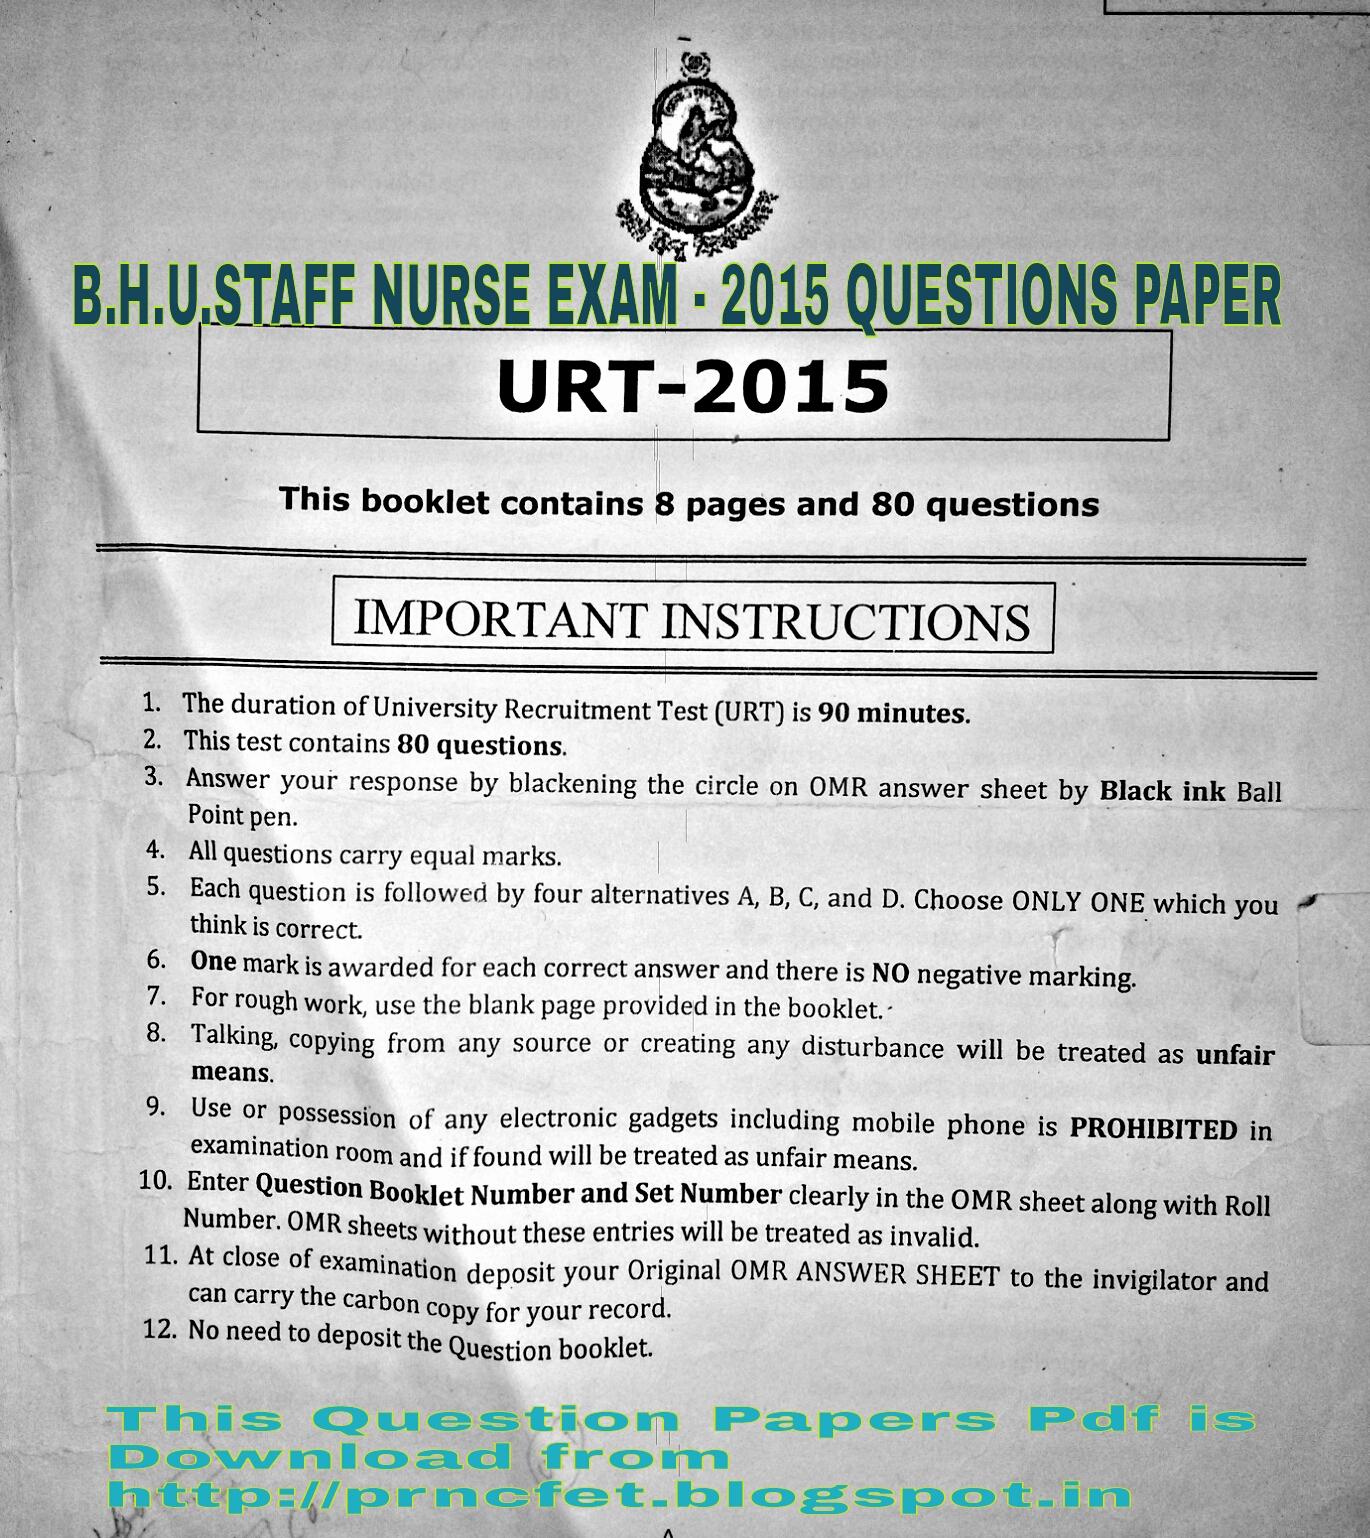 Iit Question Paper 2015 Pdf